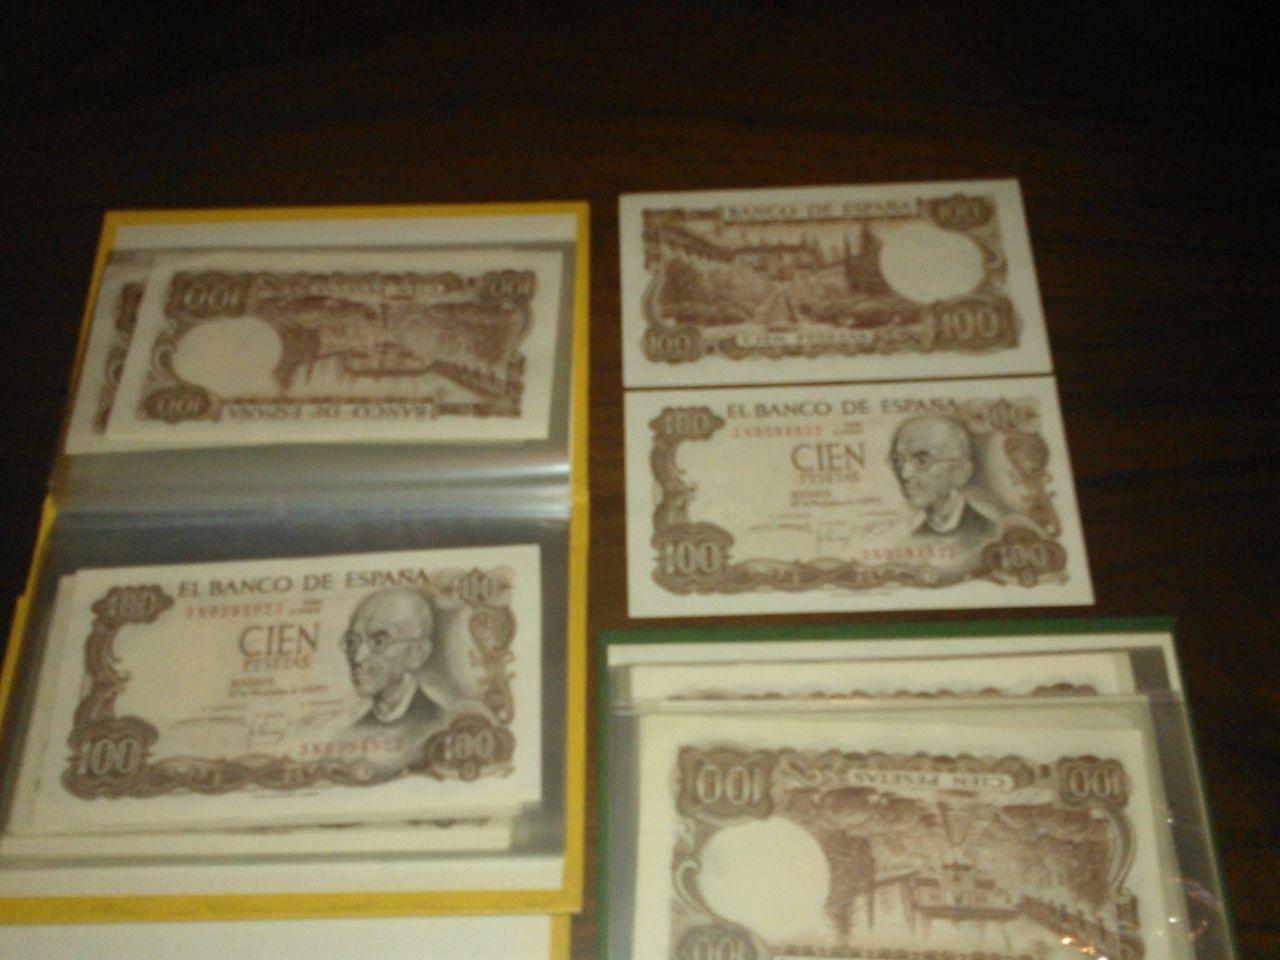 50 billetes correlativos de 100 pesetas de manuel de falla WP_000088